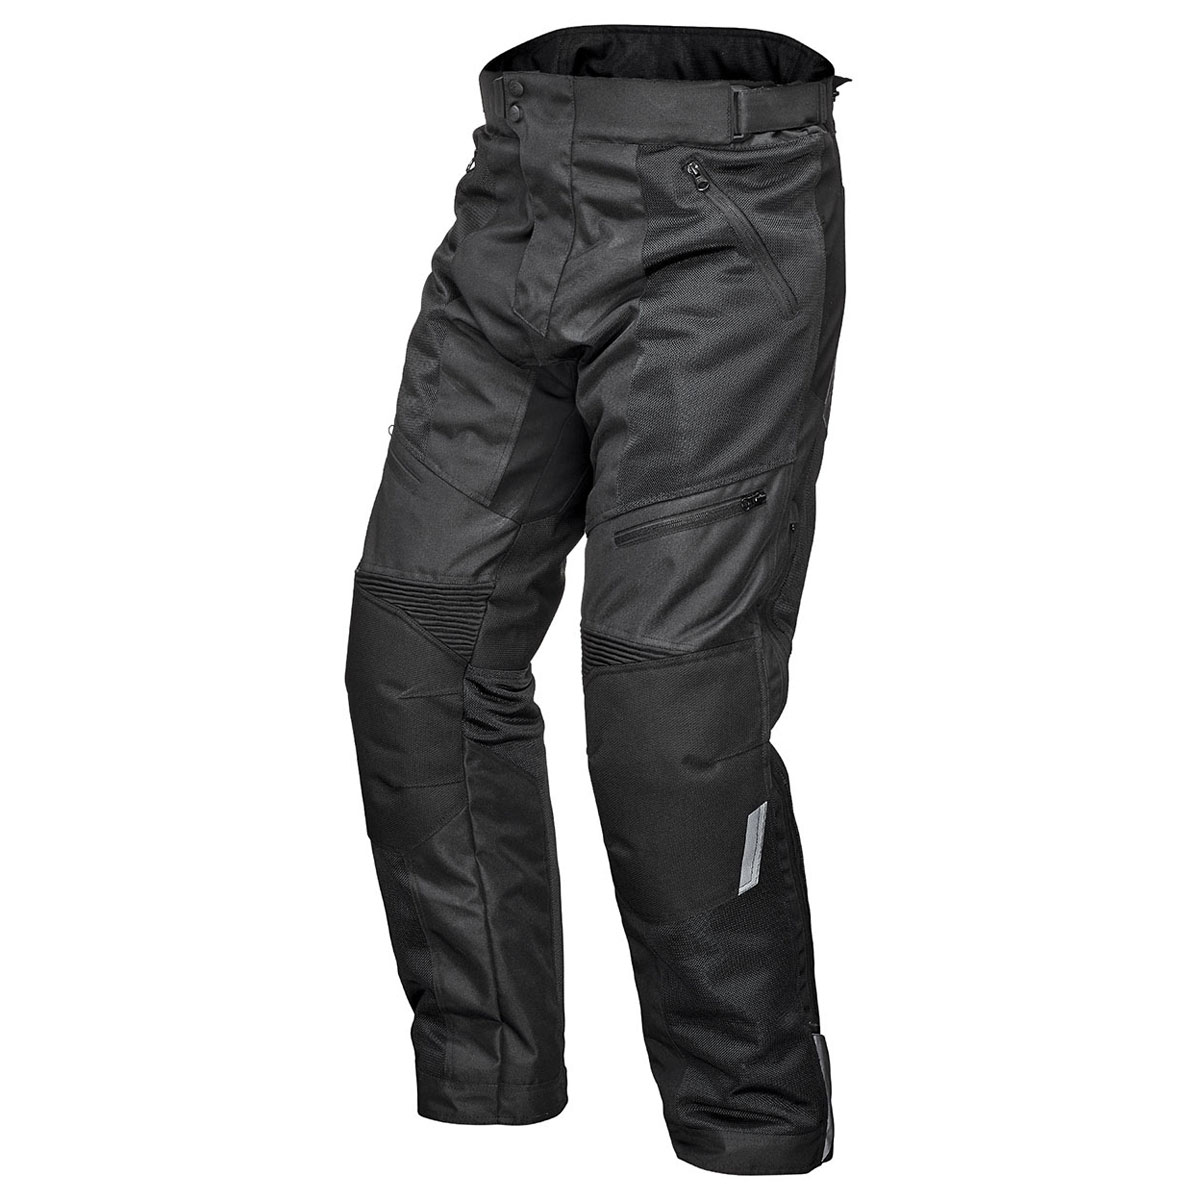 Firstgear Men's Rover Air Mesh Black Pants